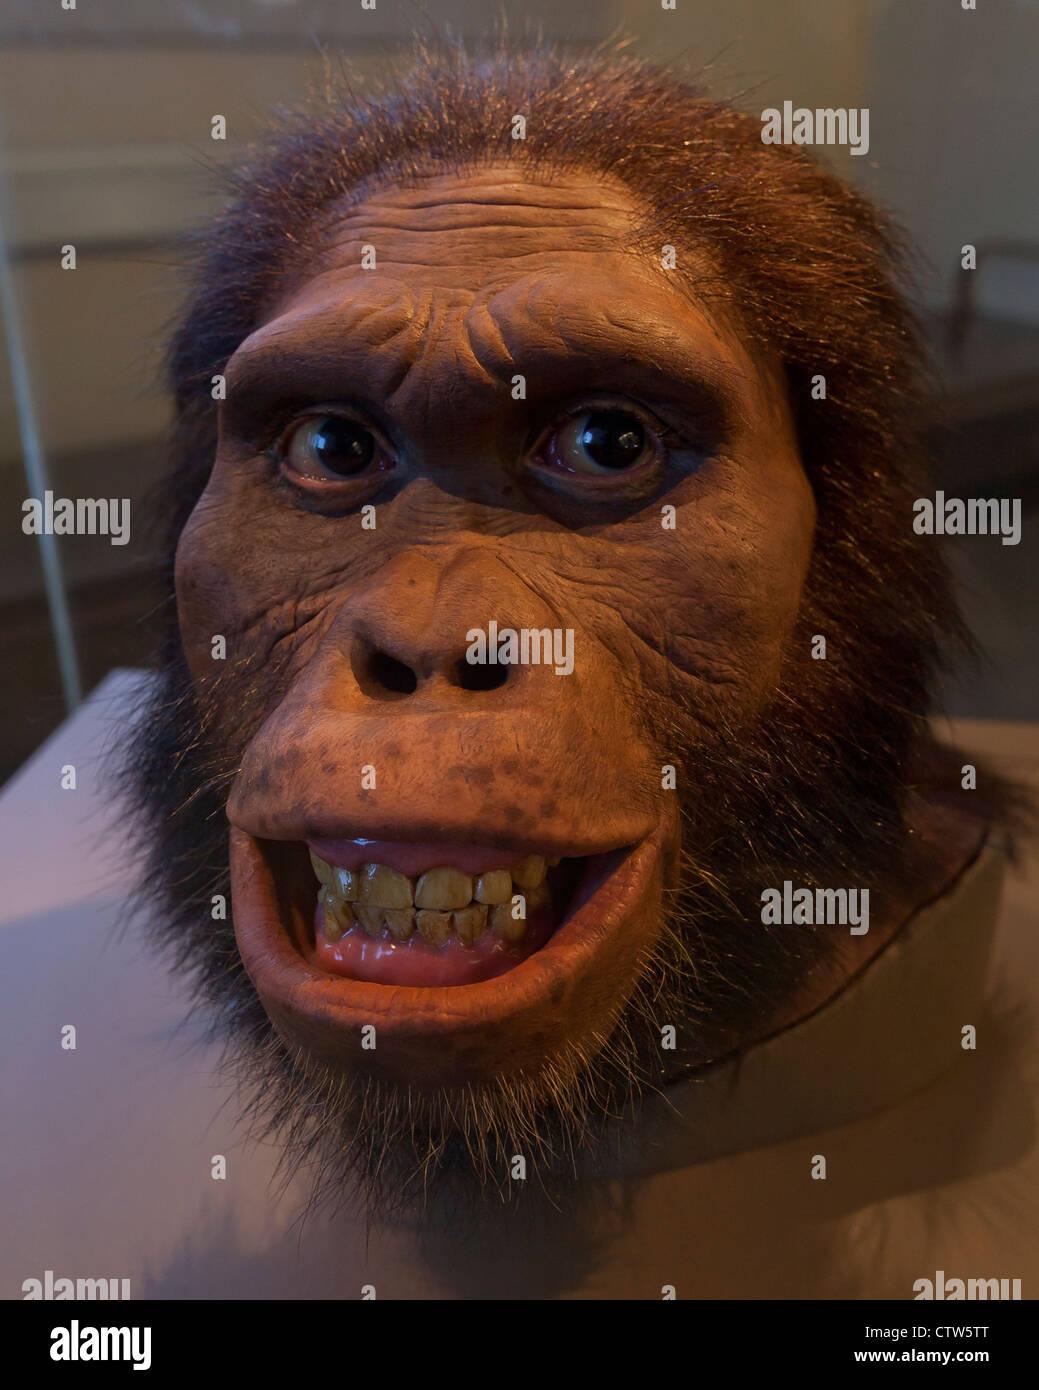 Australopithecus africanus reconstruction - American Museum of Natural History, Washington, DC - Stock Image